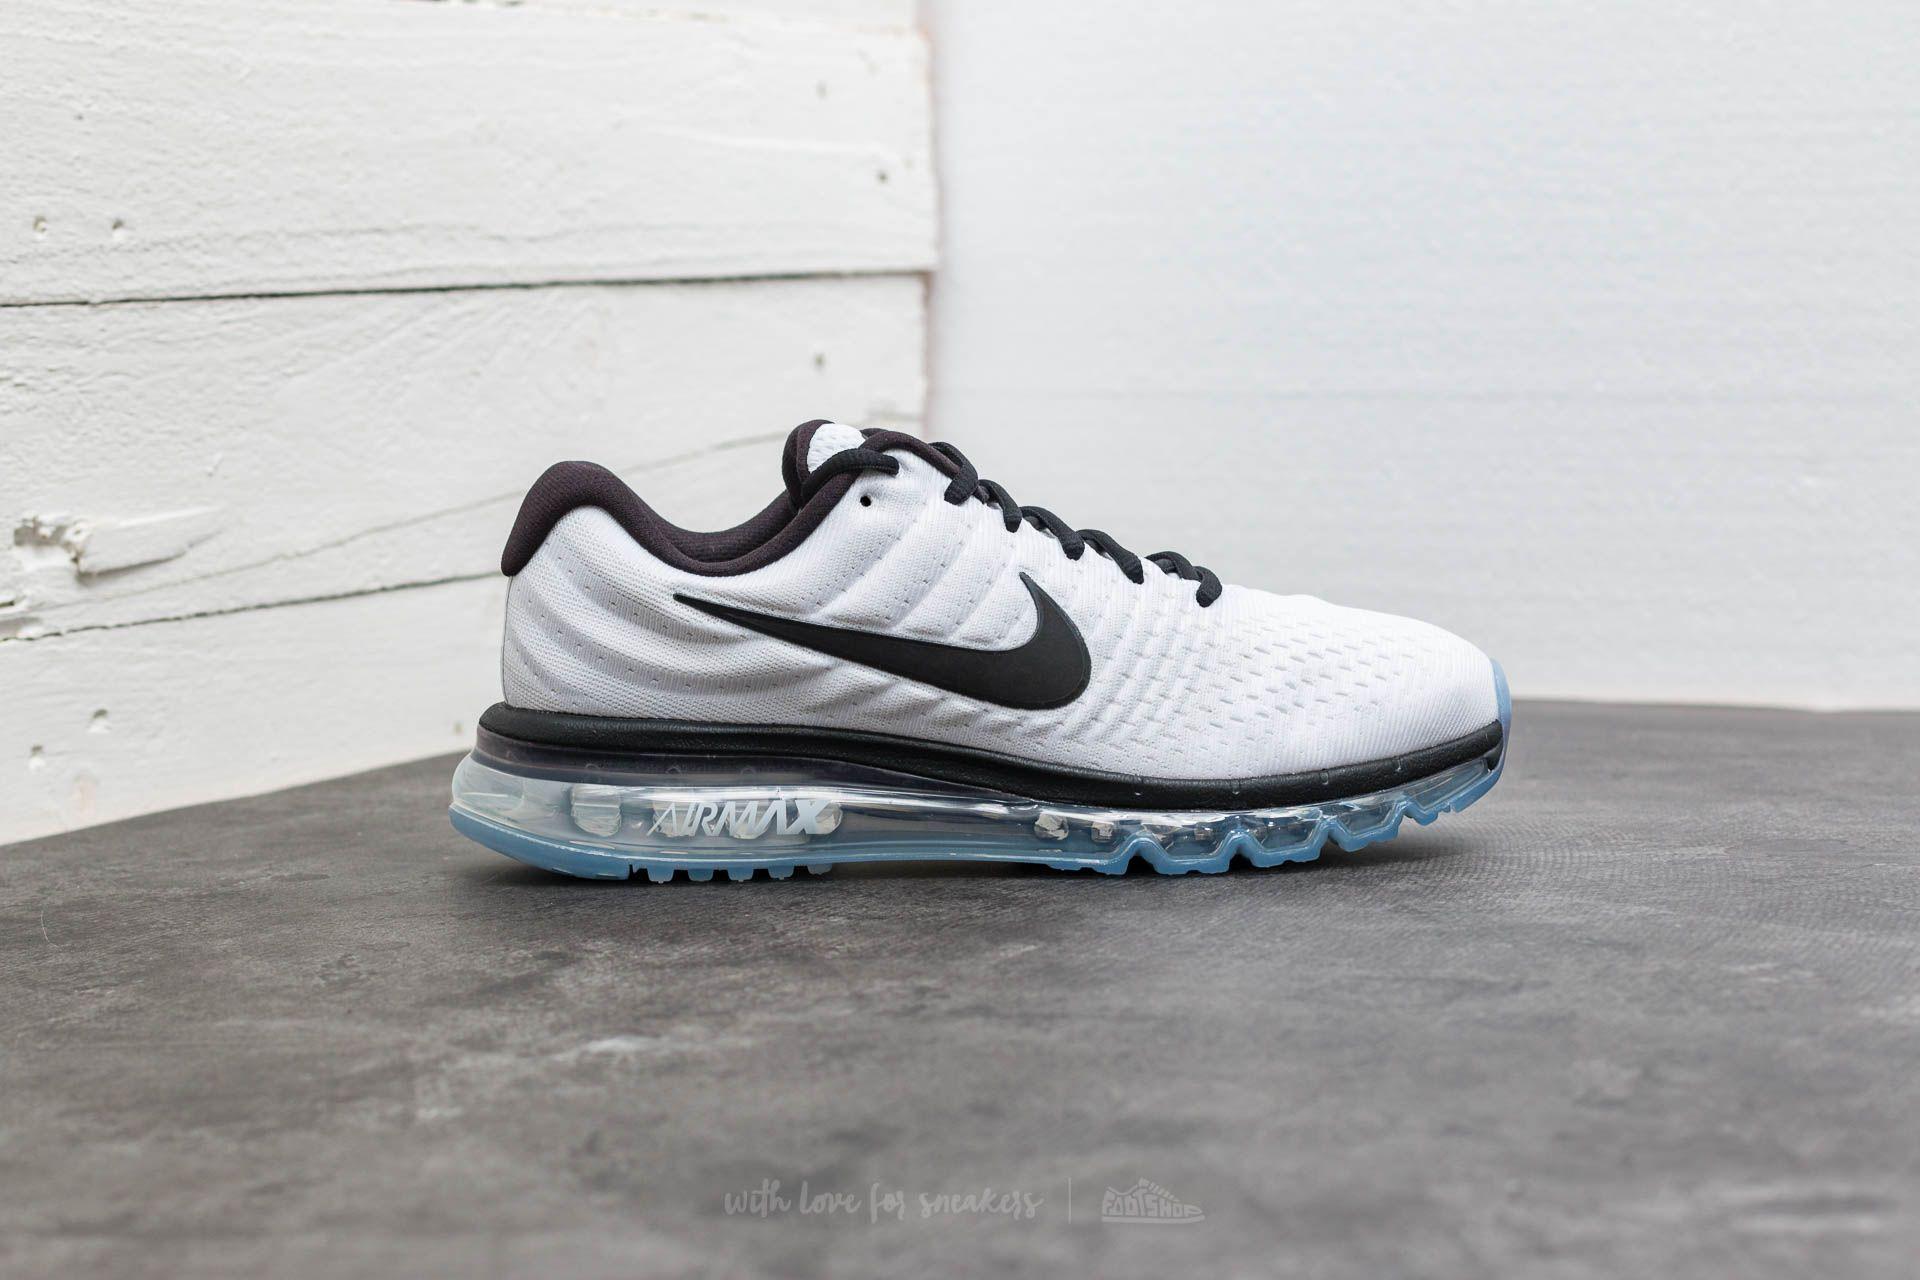 Nike Air Max 2017 White Black | Footshop